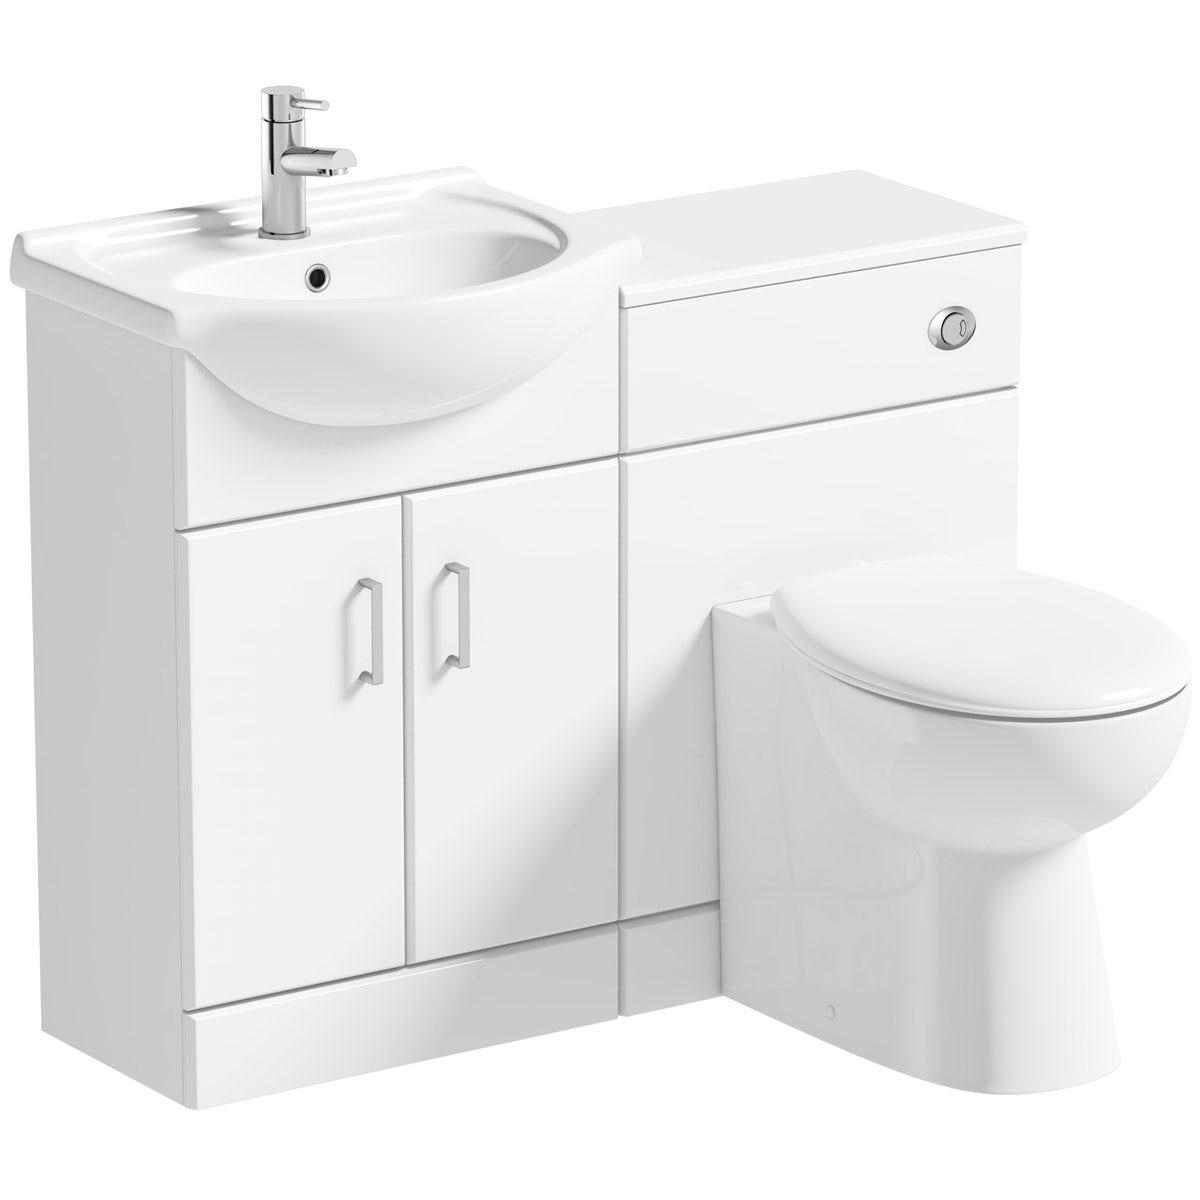 toilet and sink bathroom combination units victoriaplum com